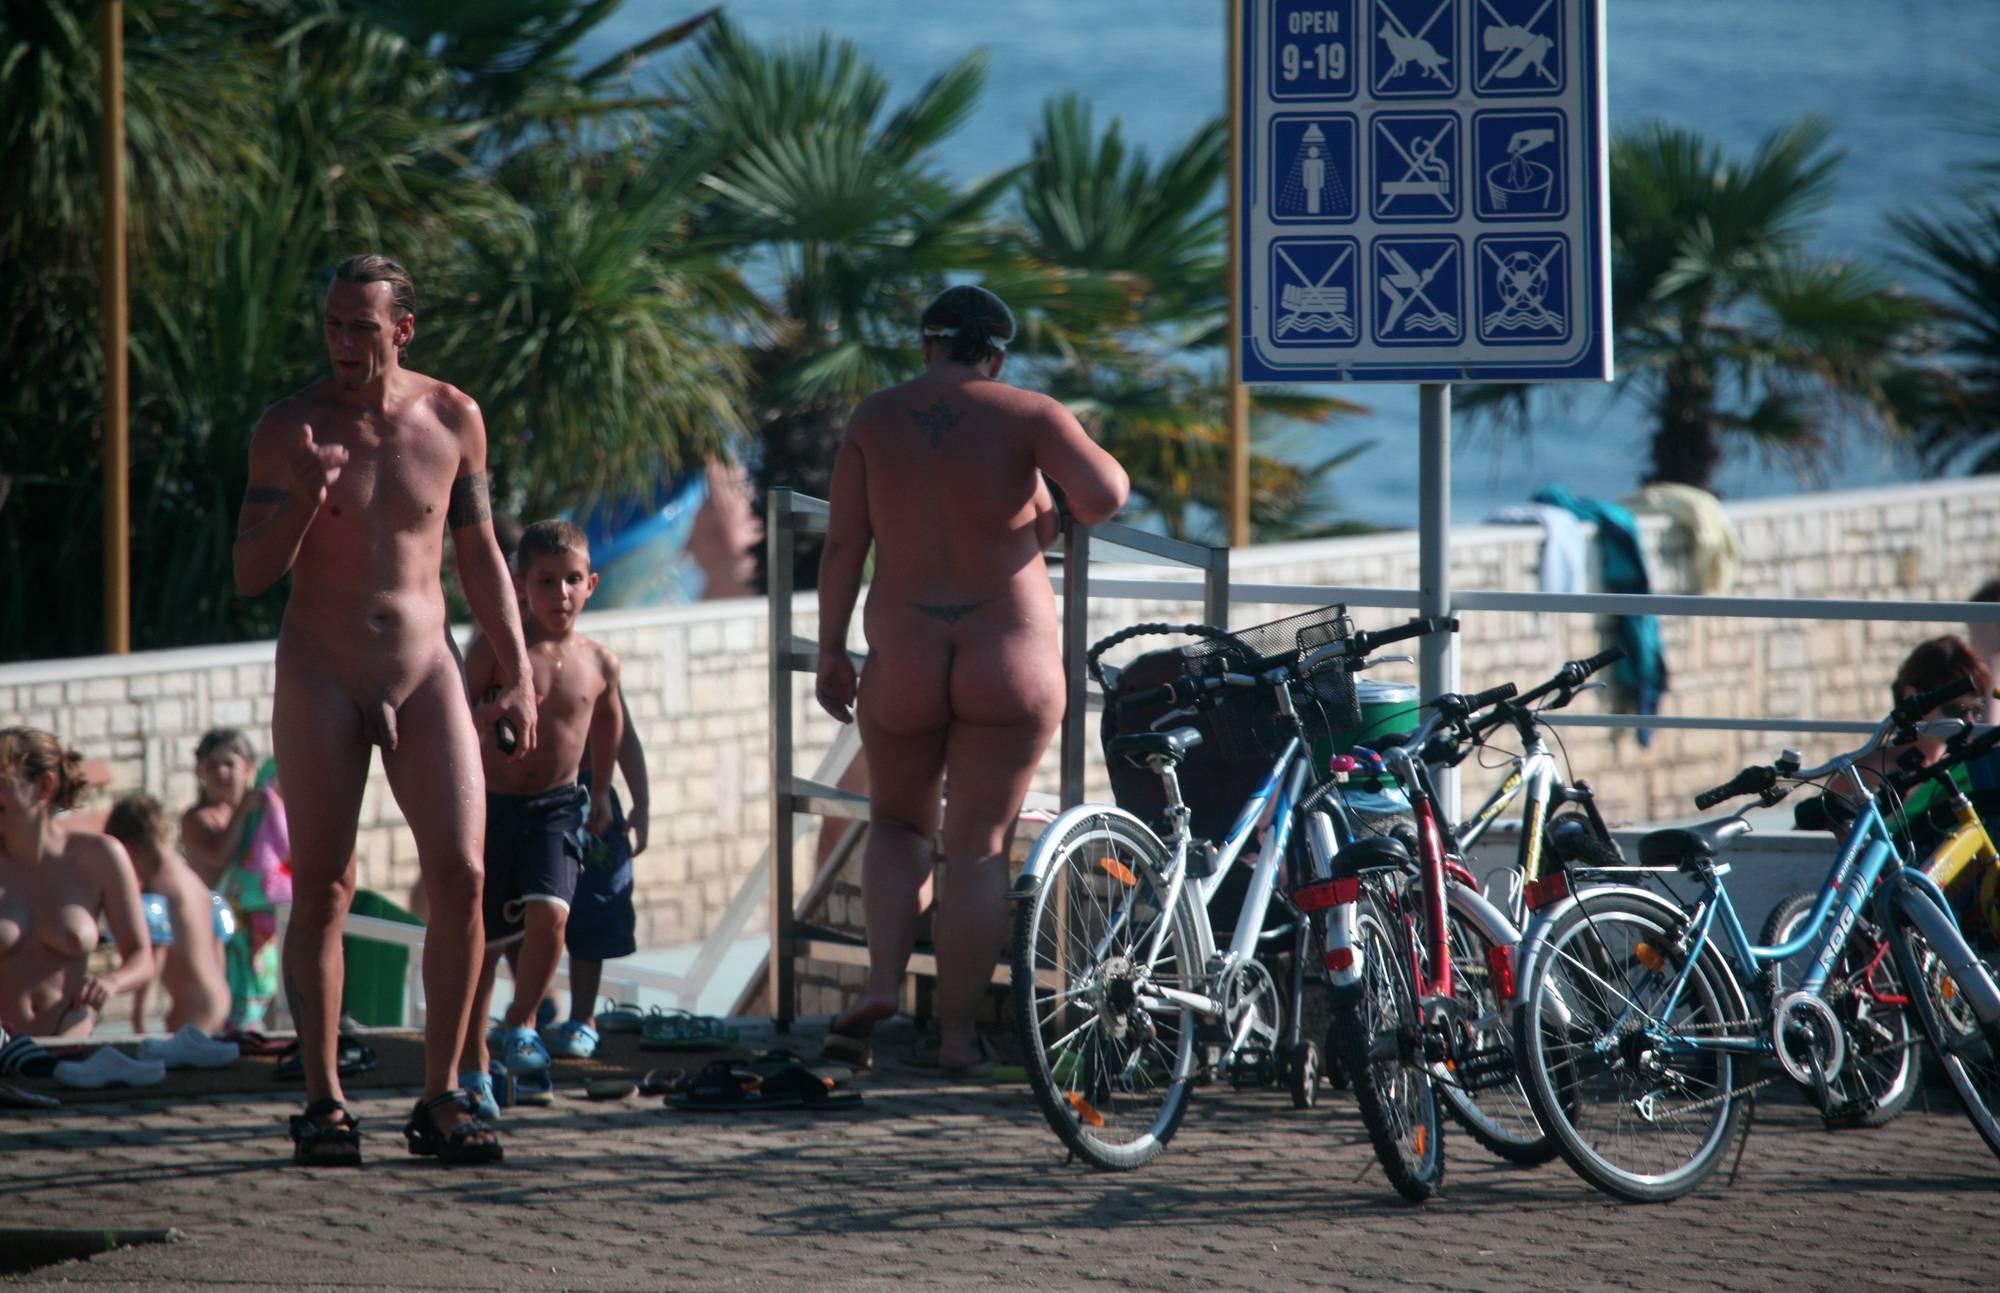 Nudist Photos The Grand Pool Entrance - 1